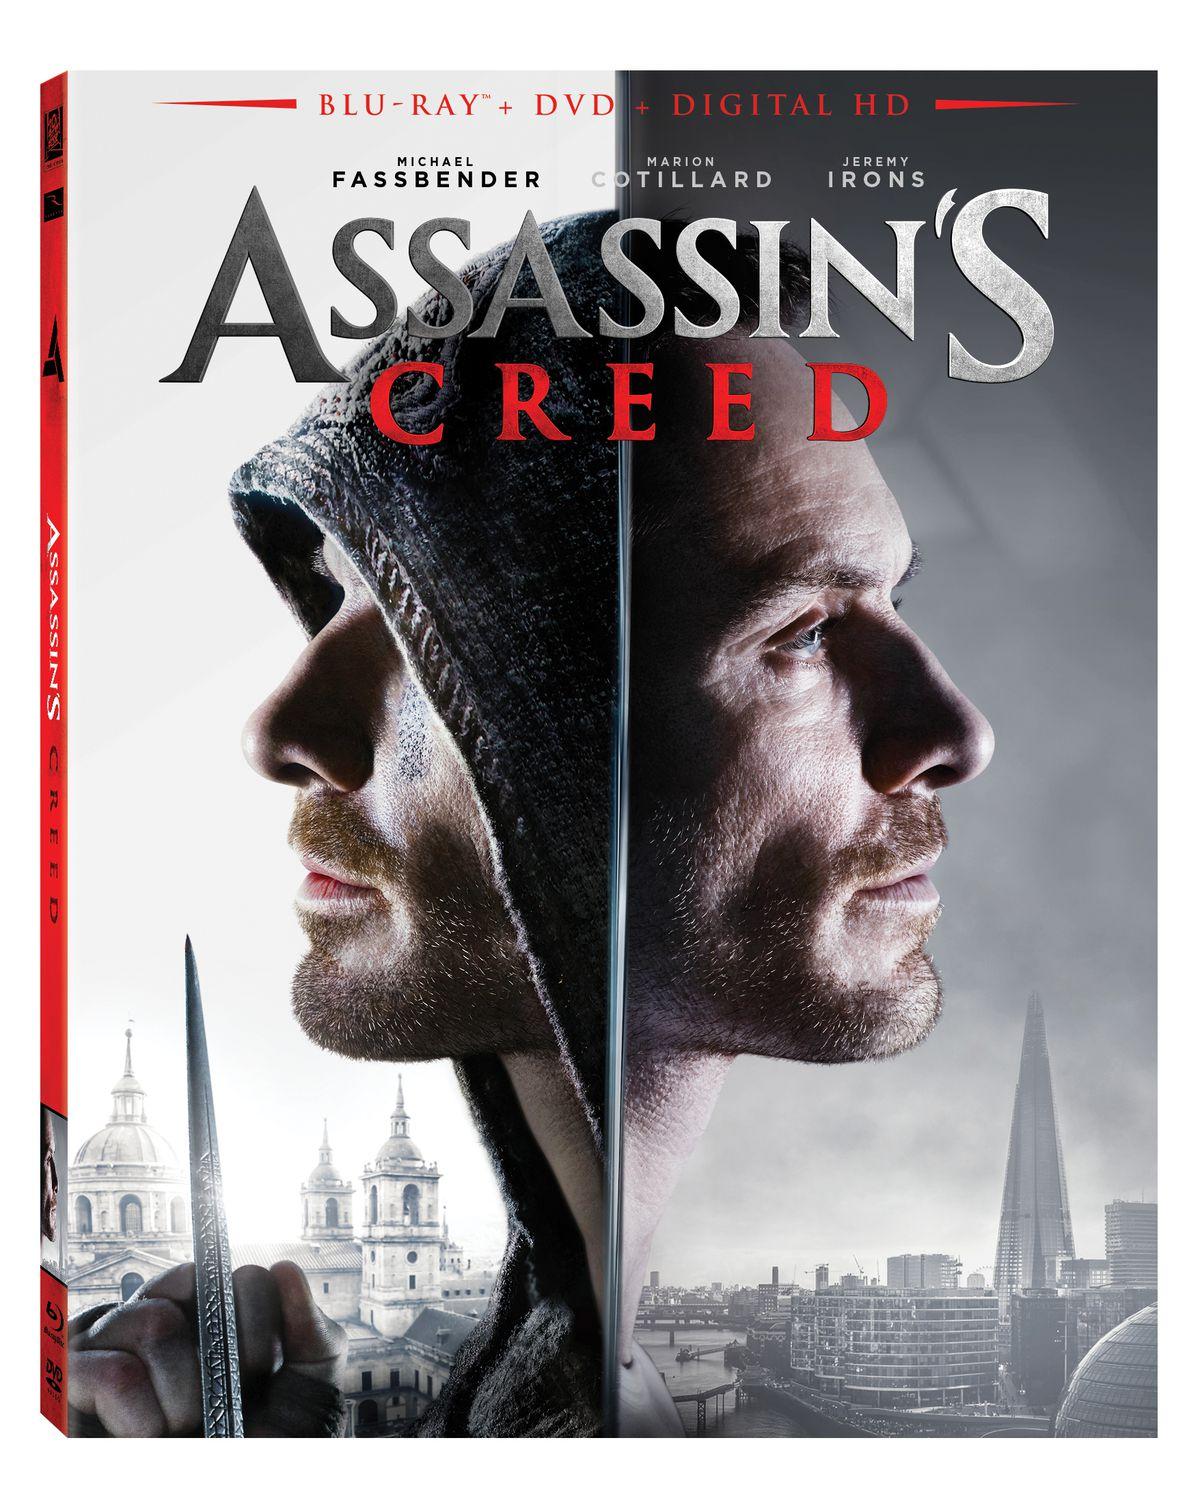 Assassin's Creed Blu-ray box art